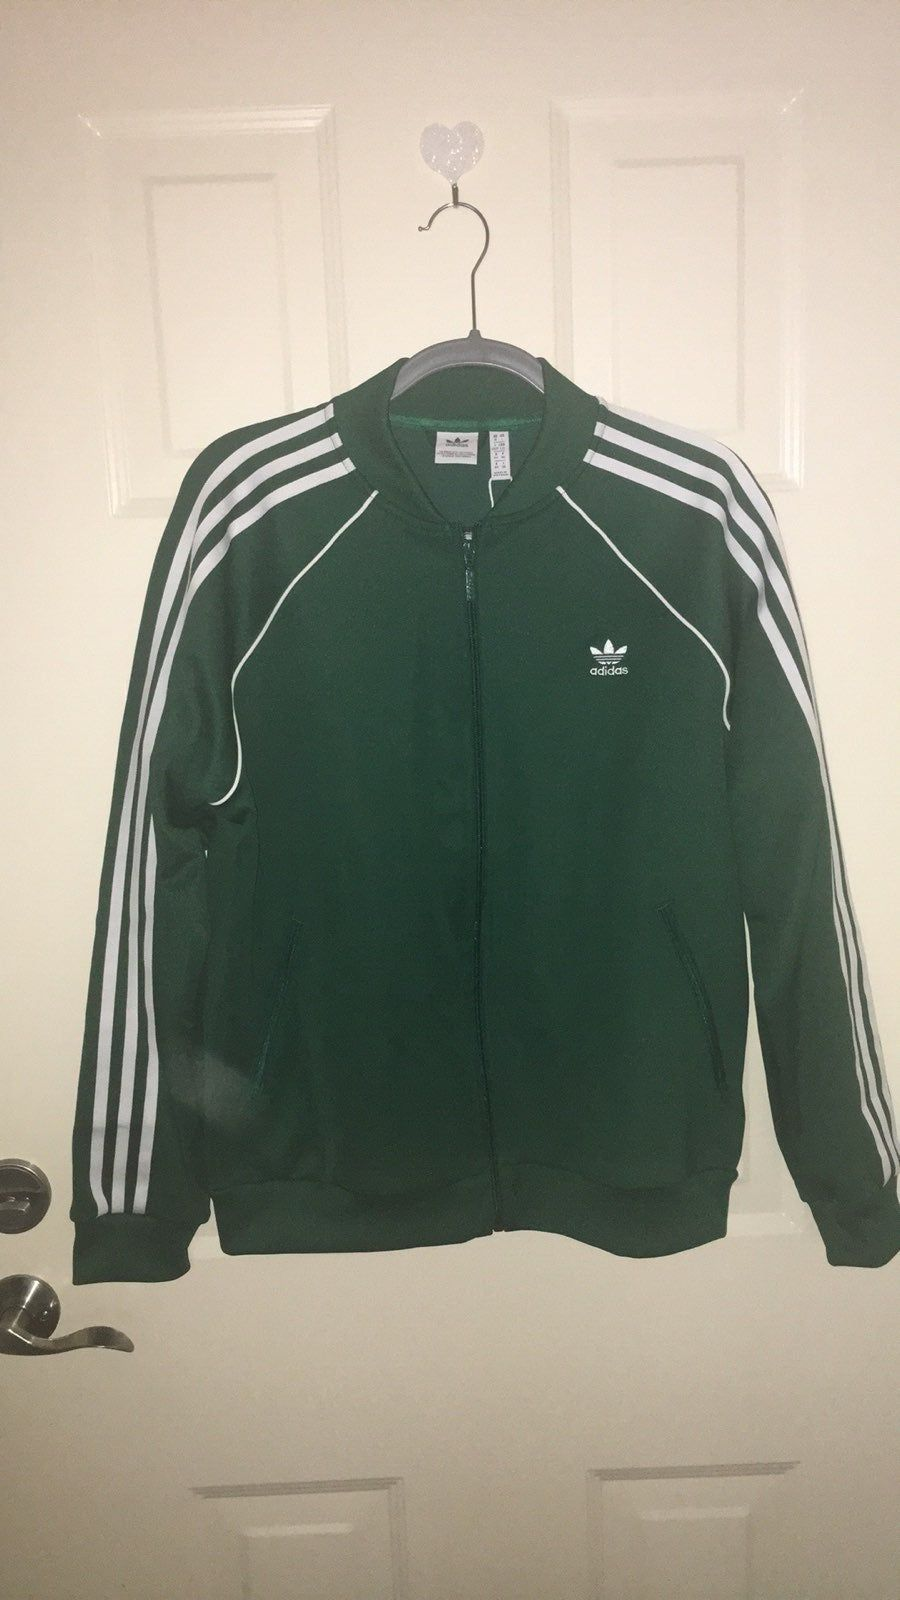 Comfy Dark Green Track Jacket Jackets Adidas Track Jacket Track Jackets [ 1600 x 900 Pixel ]